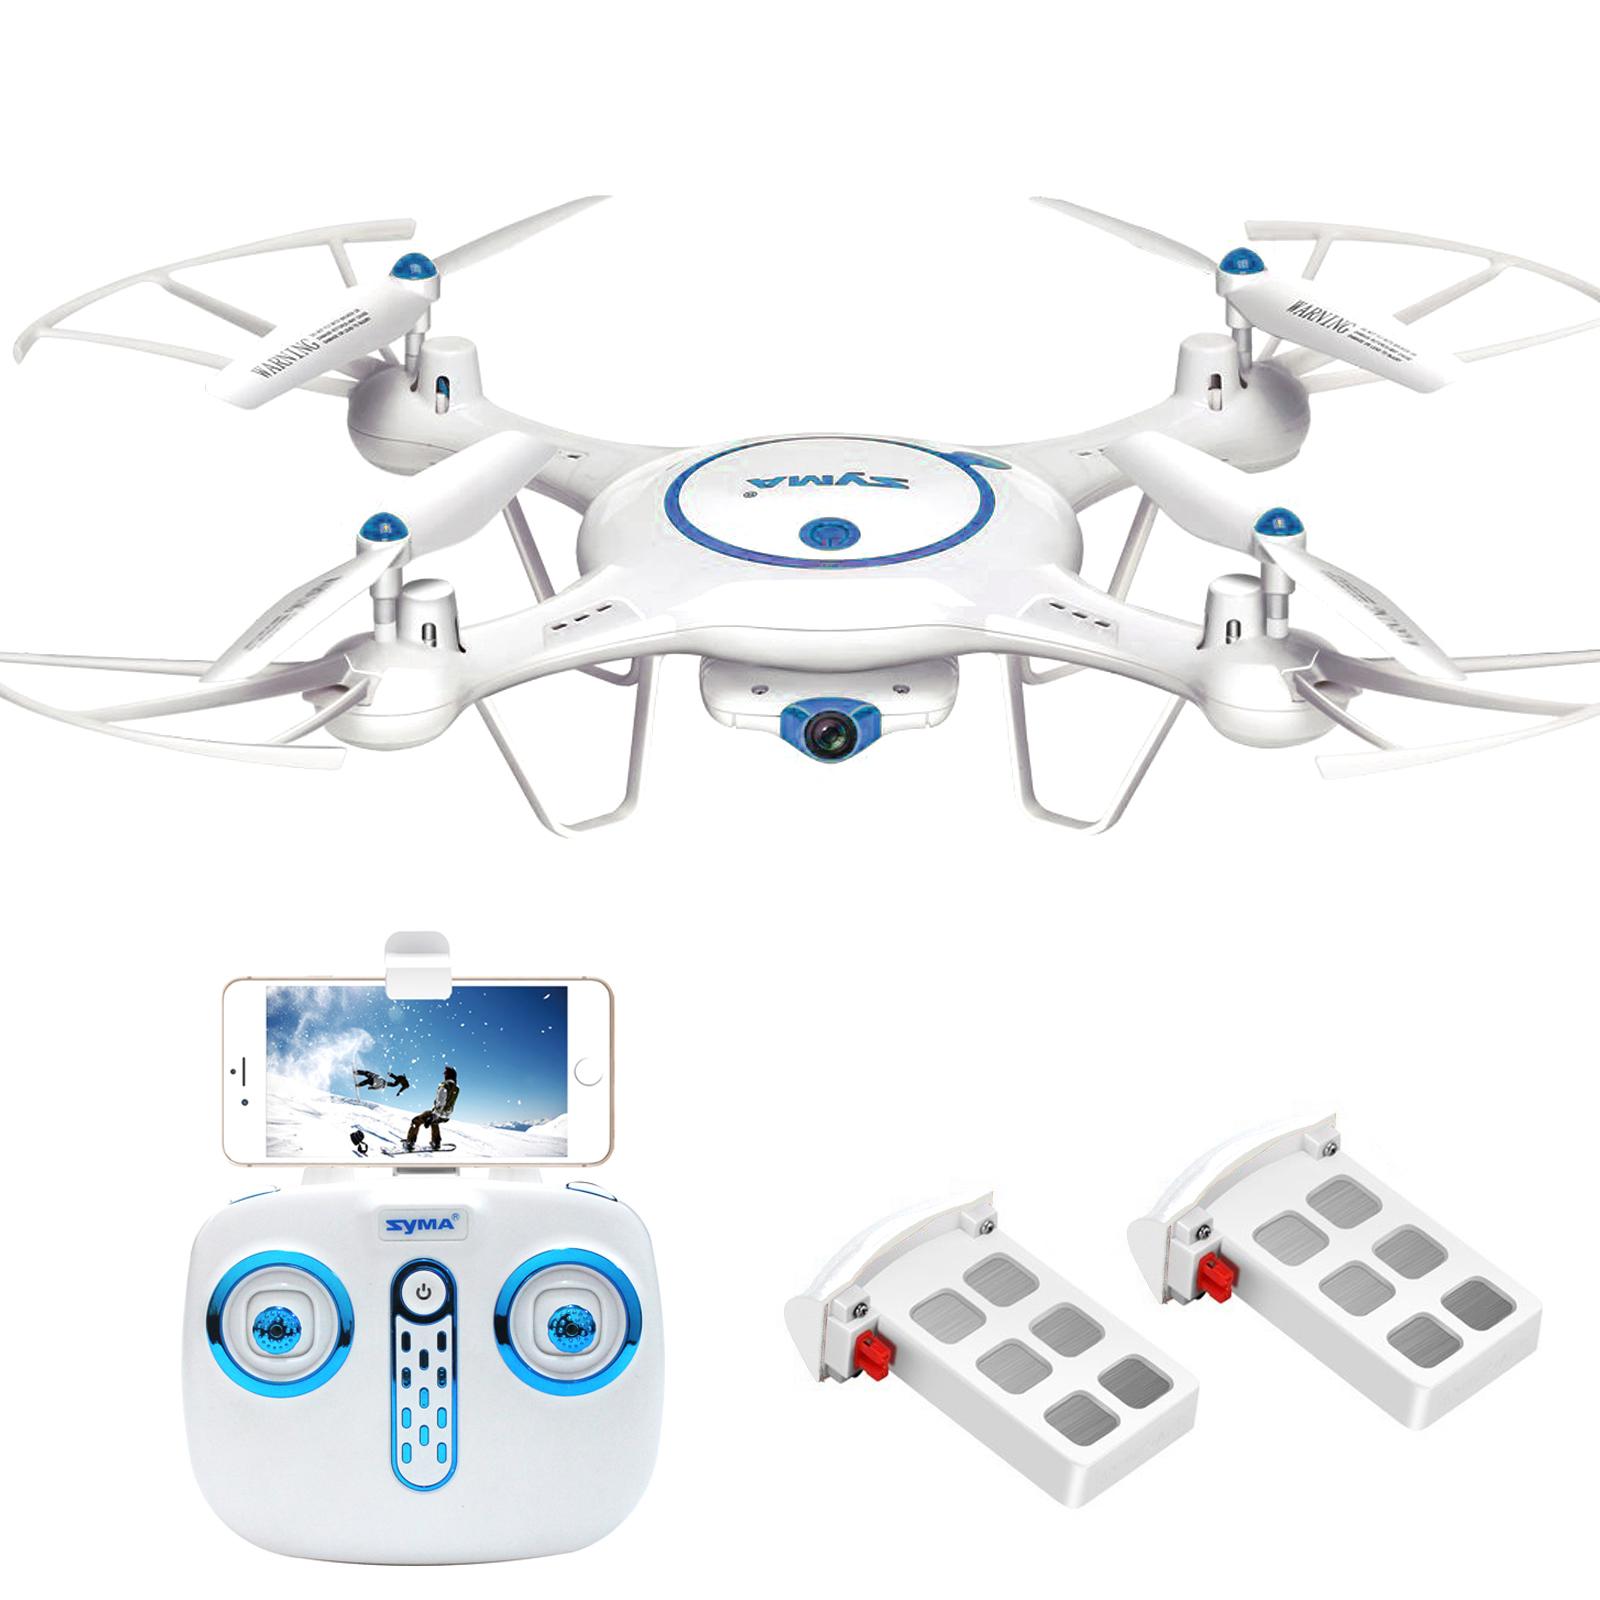 Syma X5UW Wifi FPV RC Quadcopter Drone With 720P HD Camera